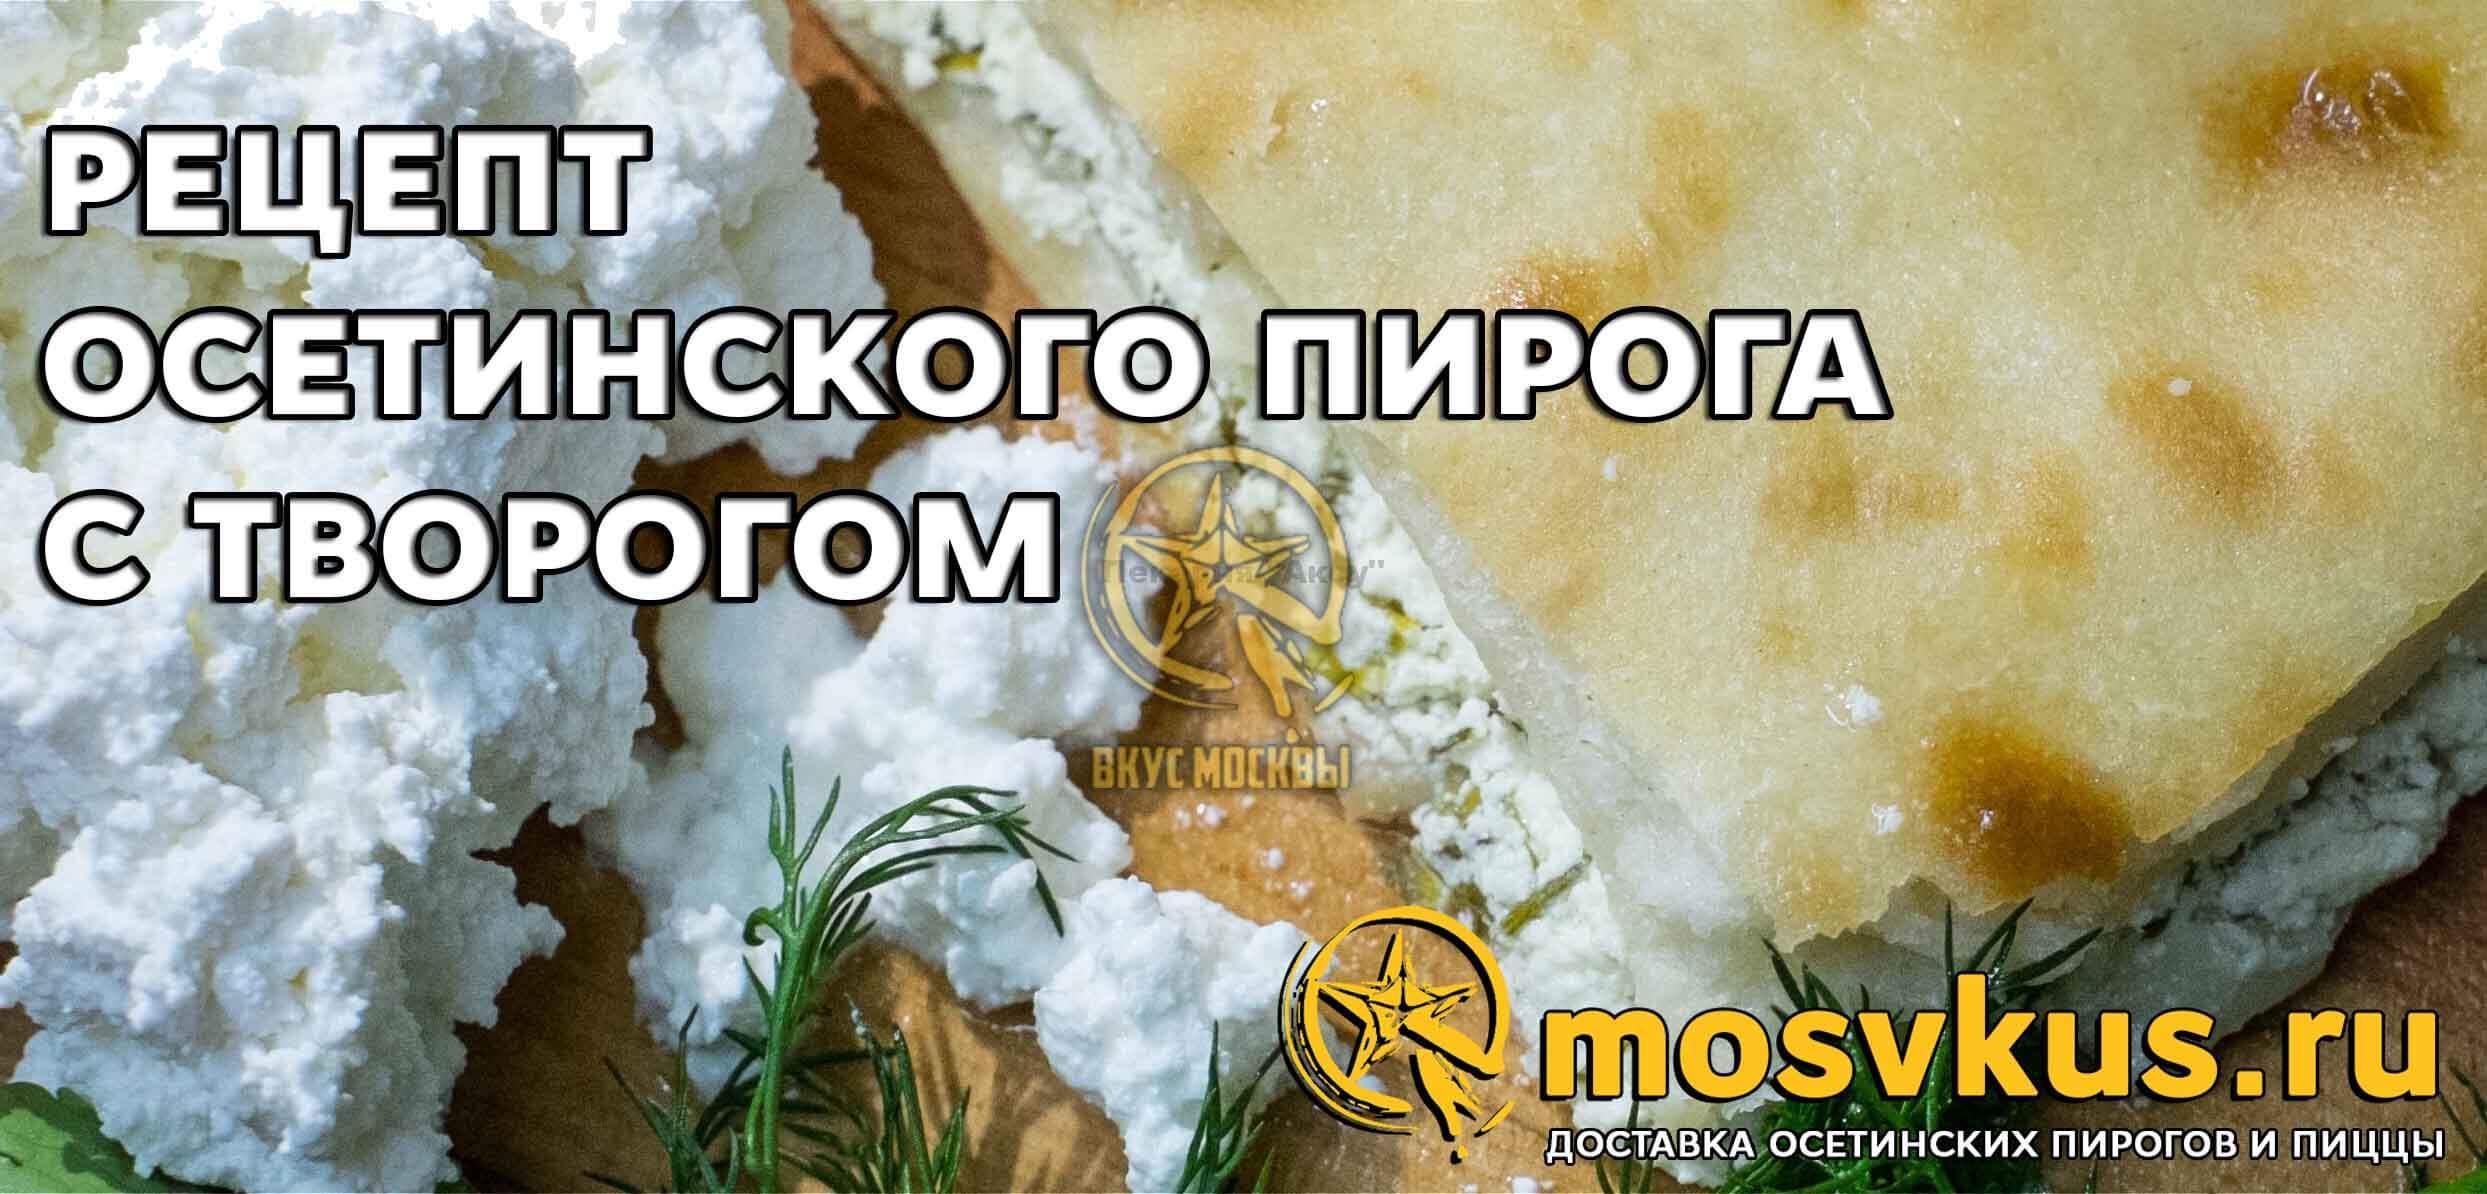 Рецепт осетинского пирога с творогом.